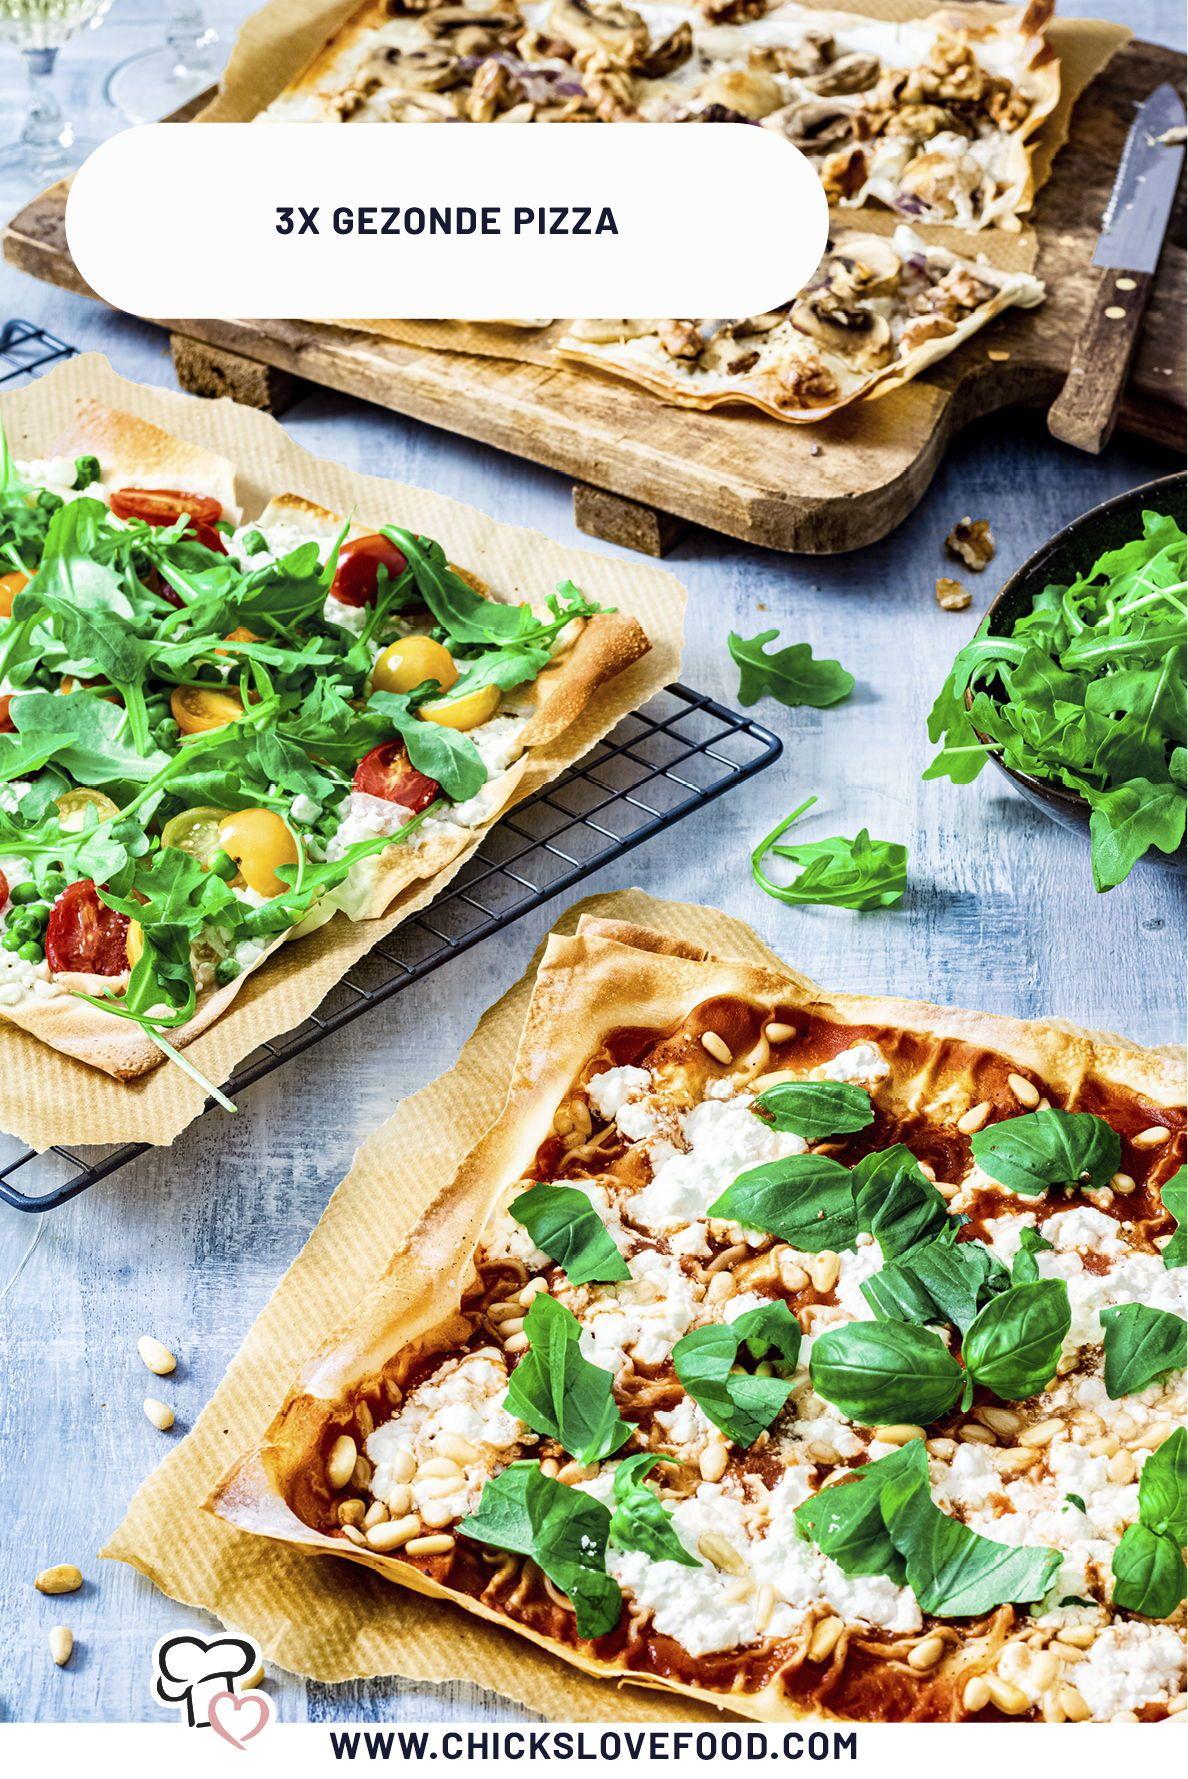 3x gezonde pizza - Chickslovefood